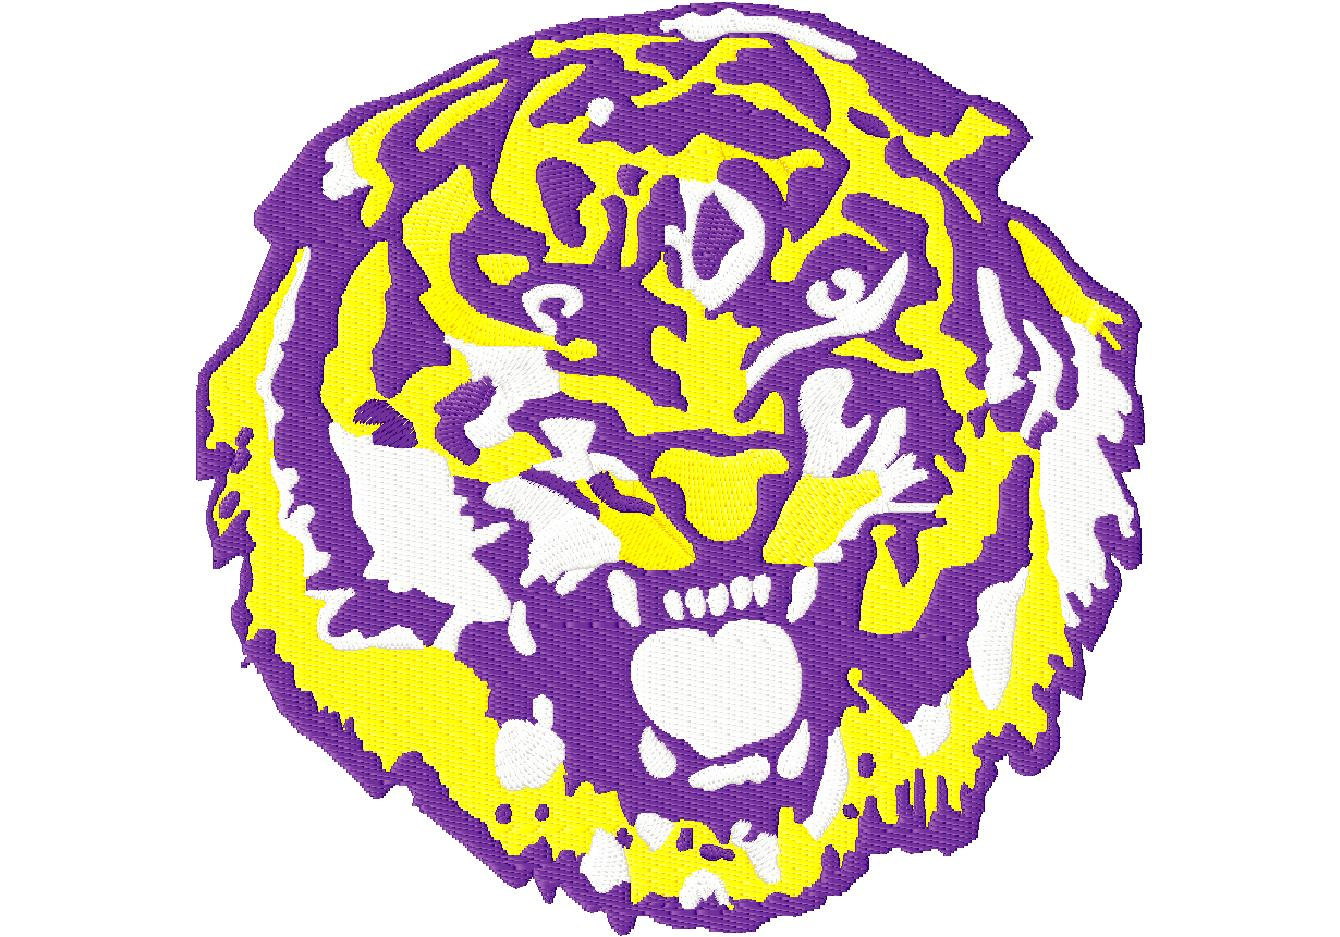 Lsu Tiger.